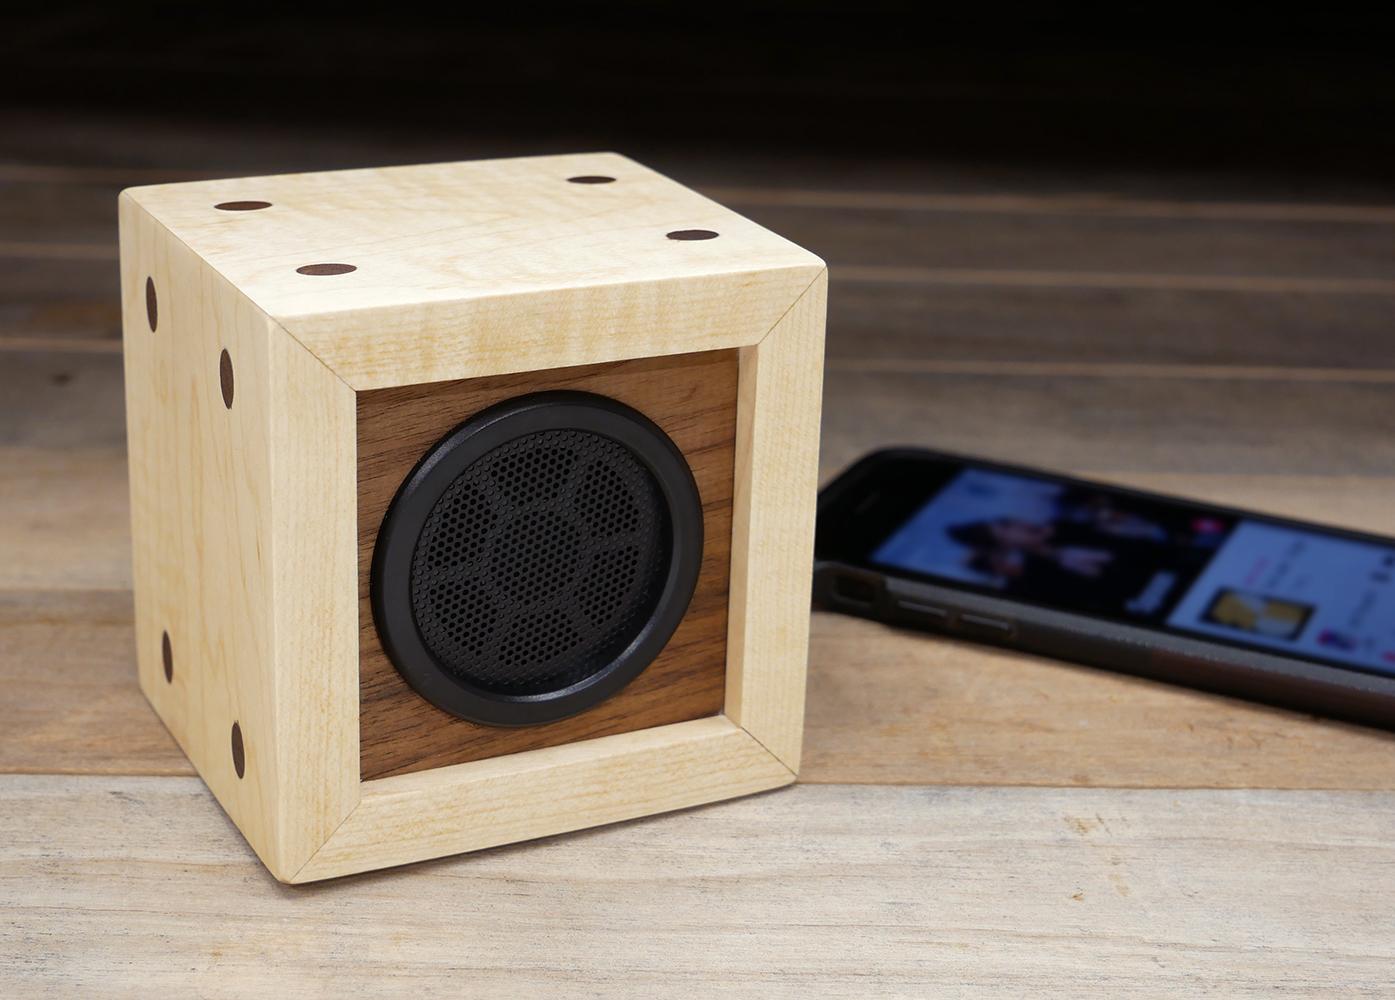 Wireless Speaker Box Make And Take